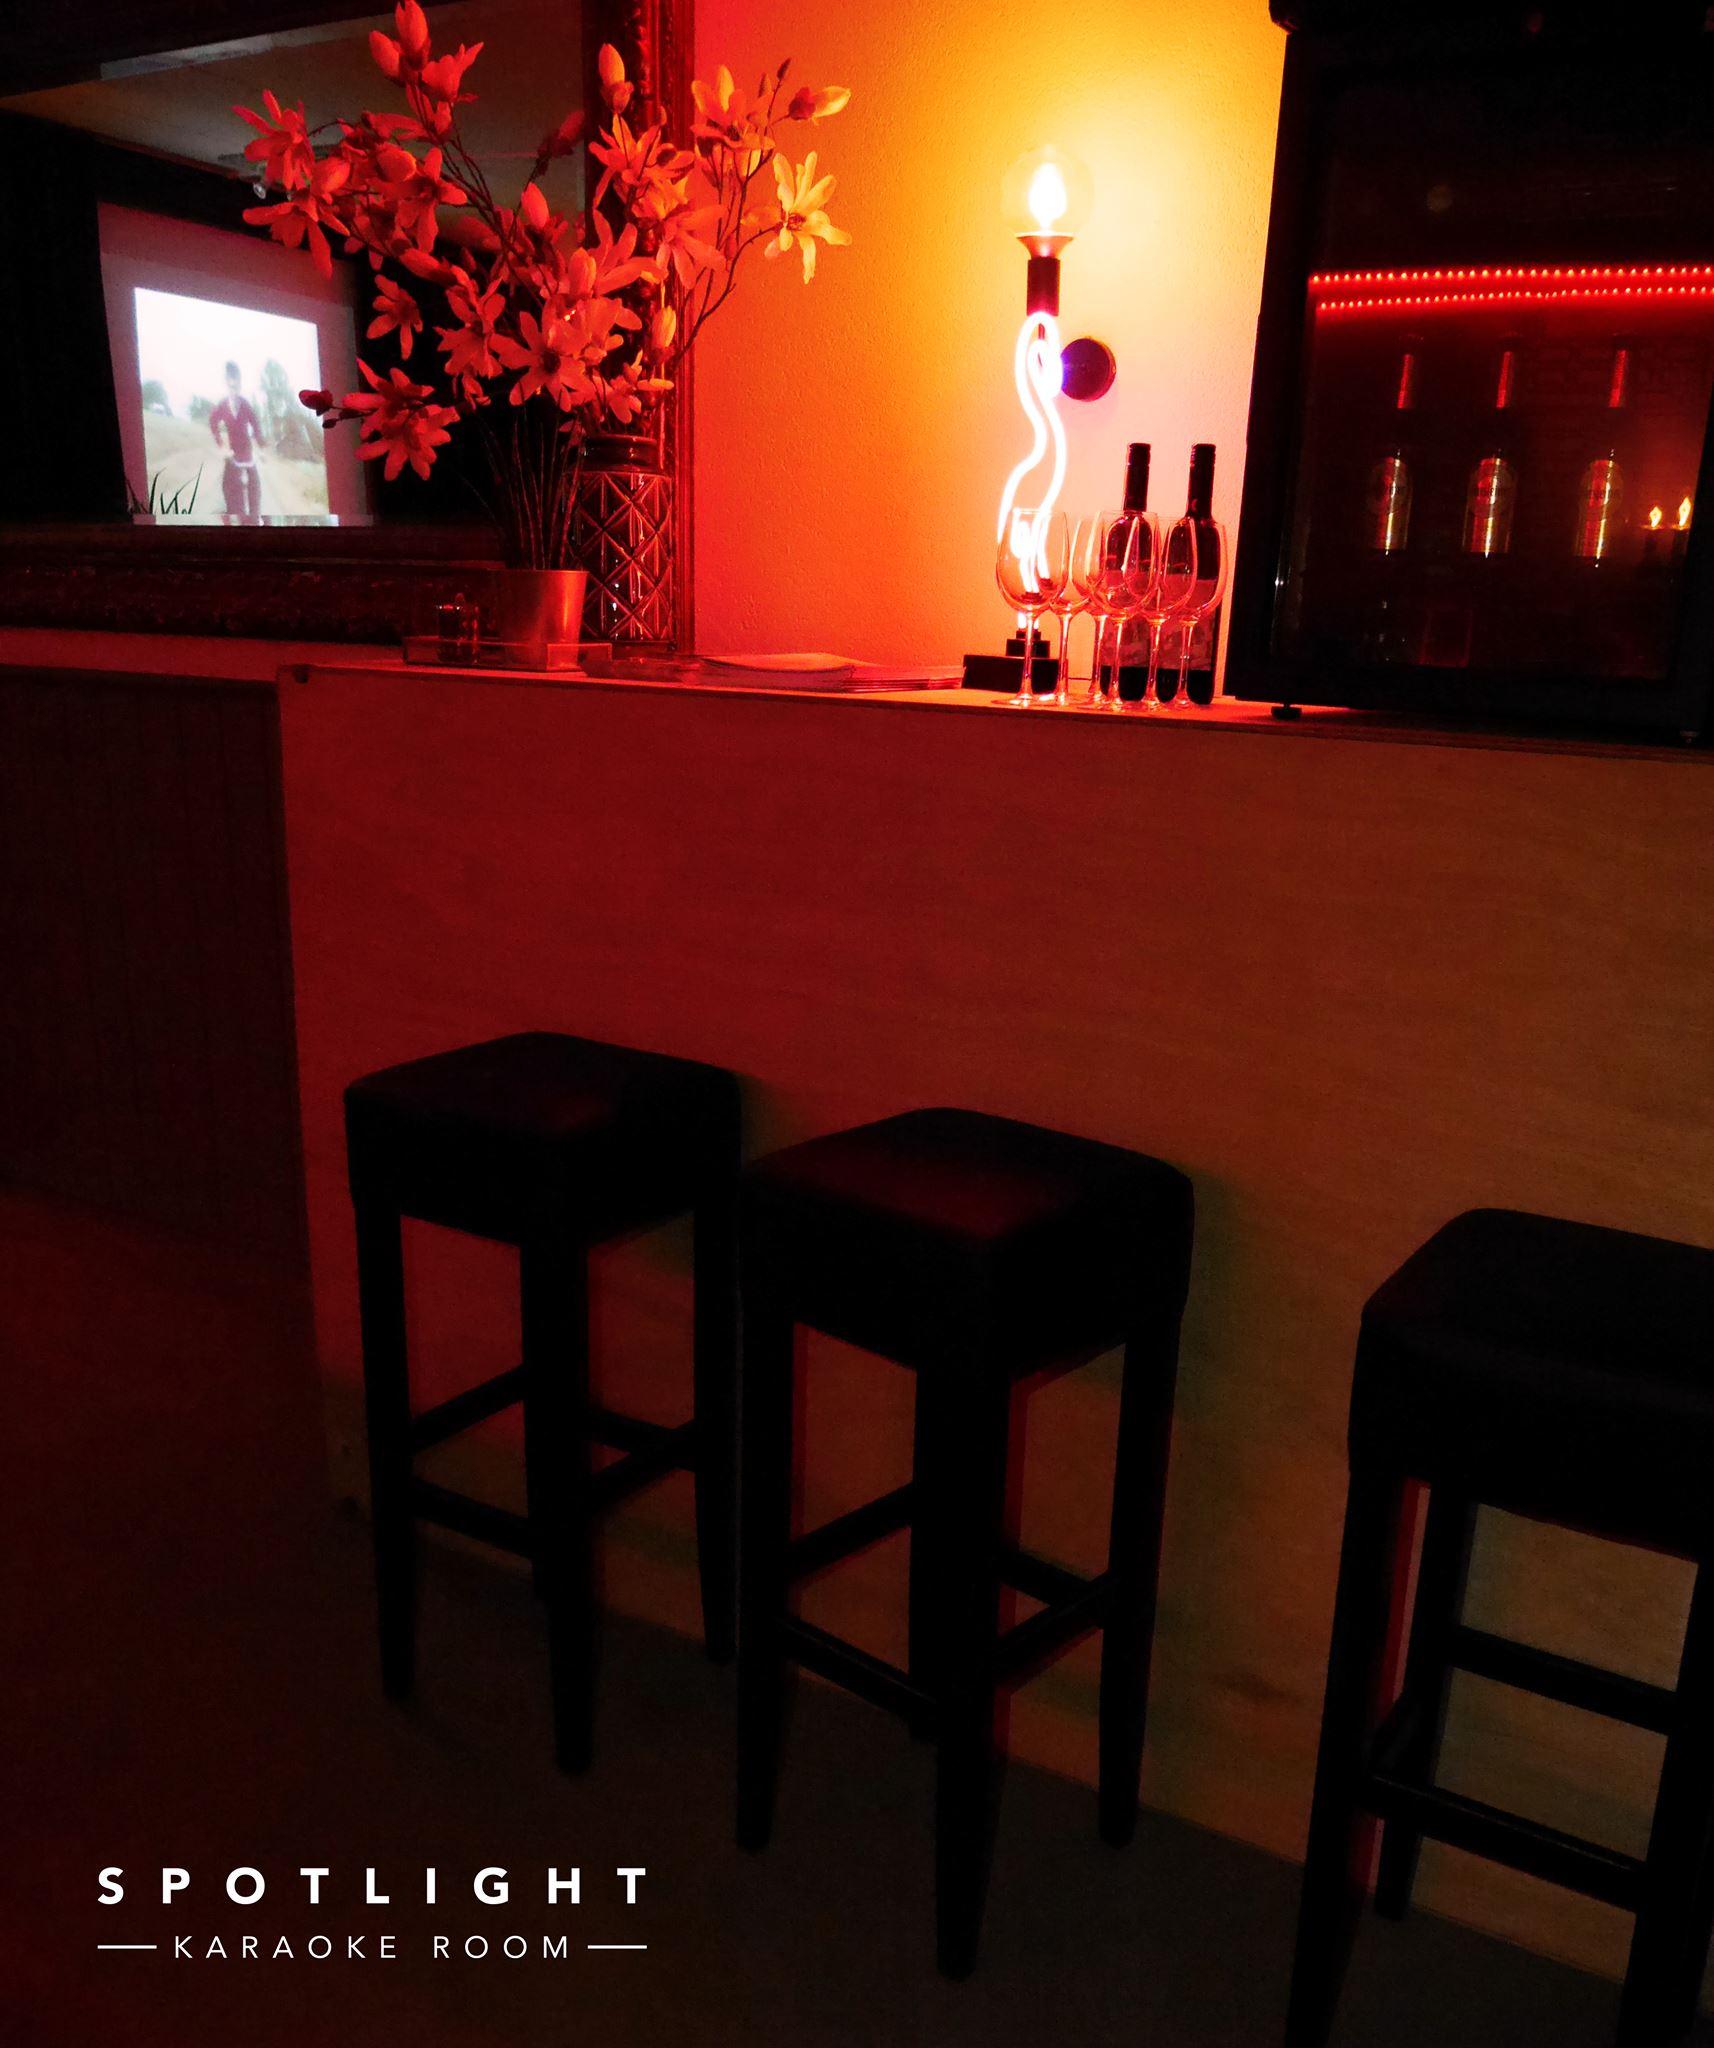 retro-karaoke-prive-spotlight